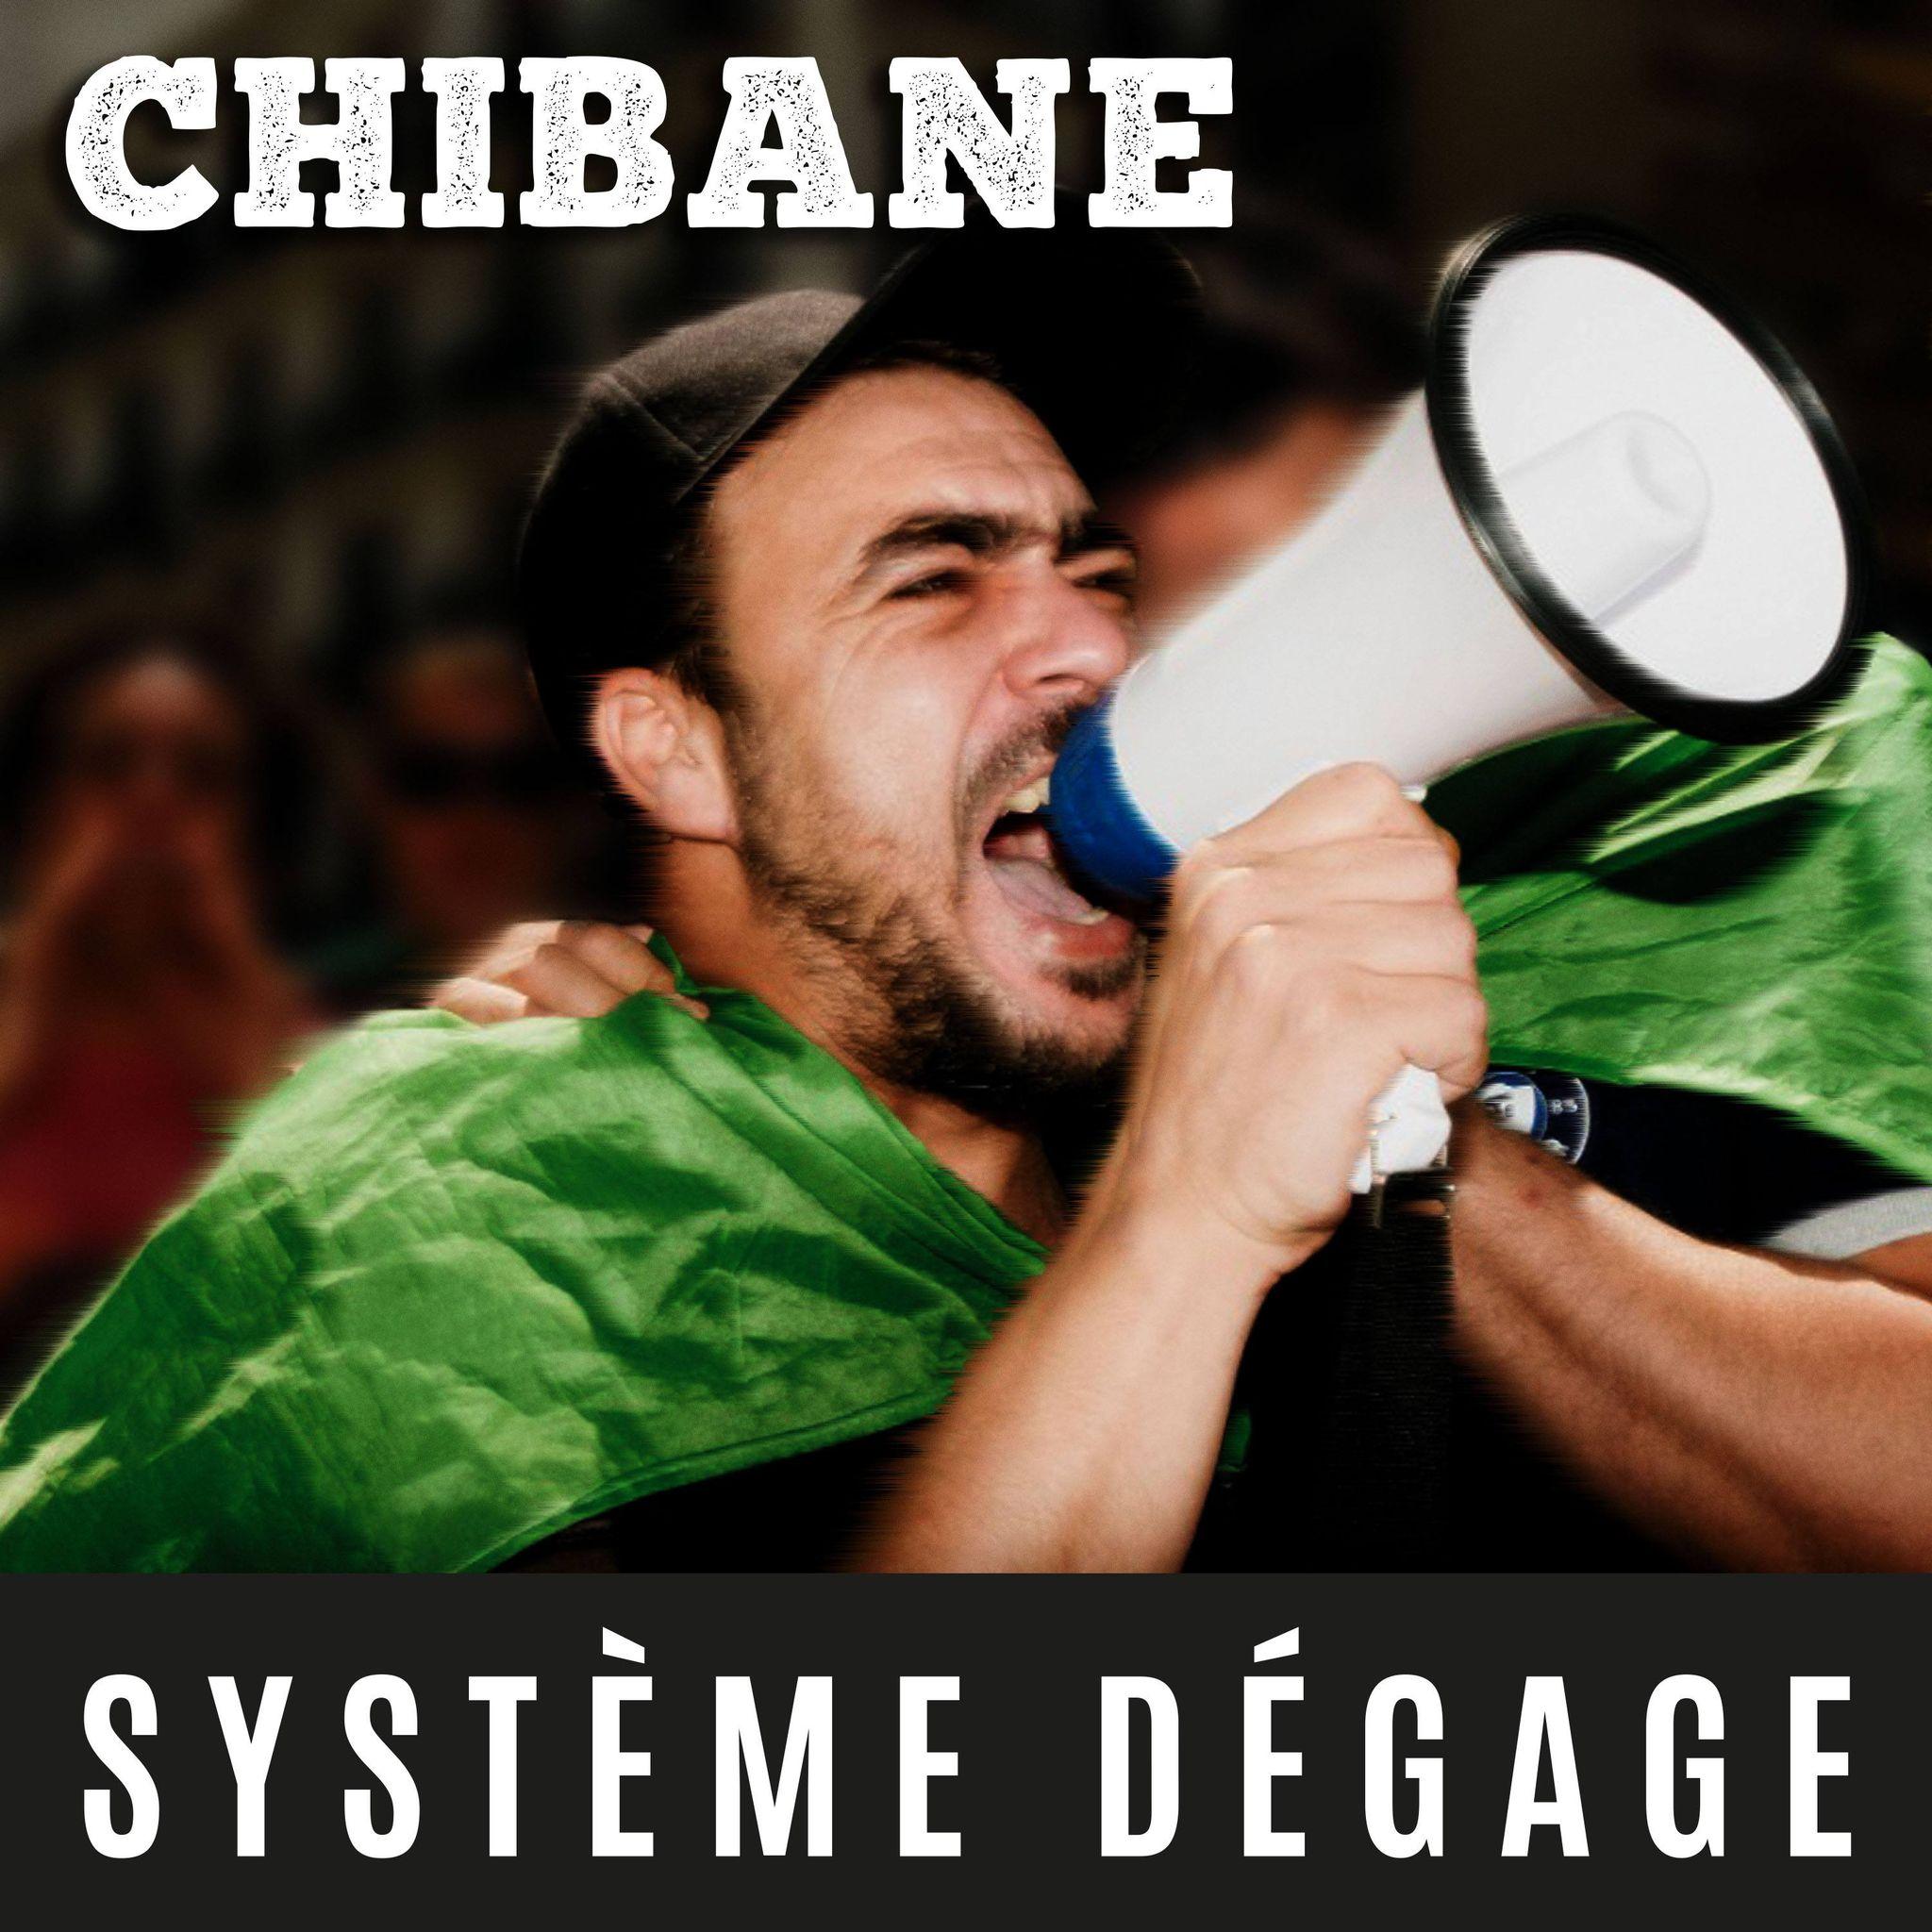 Chibane